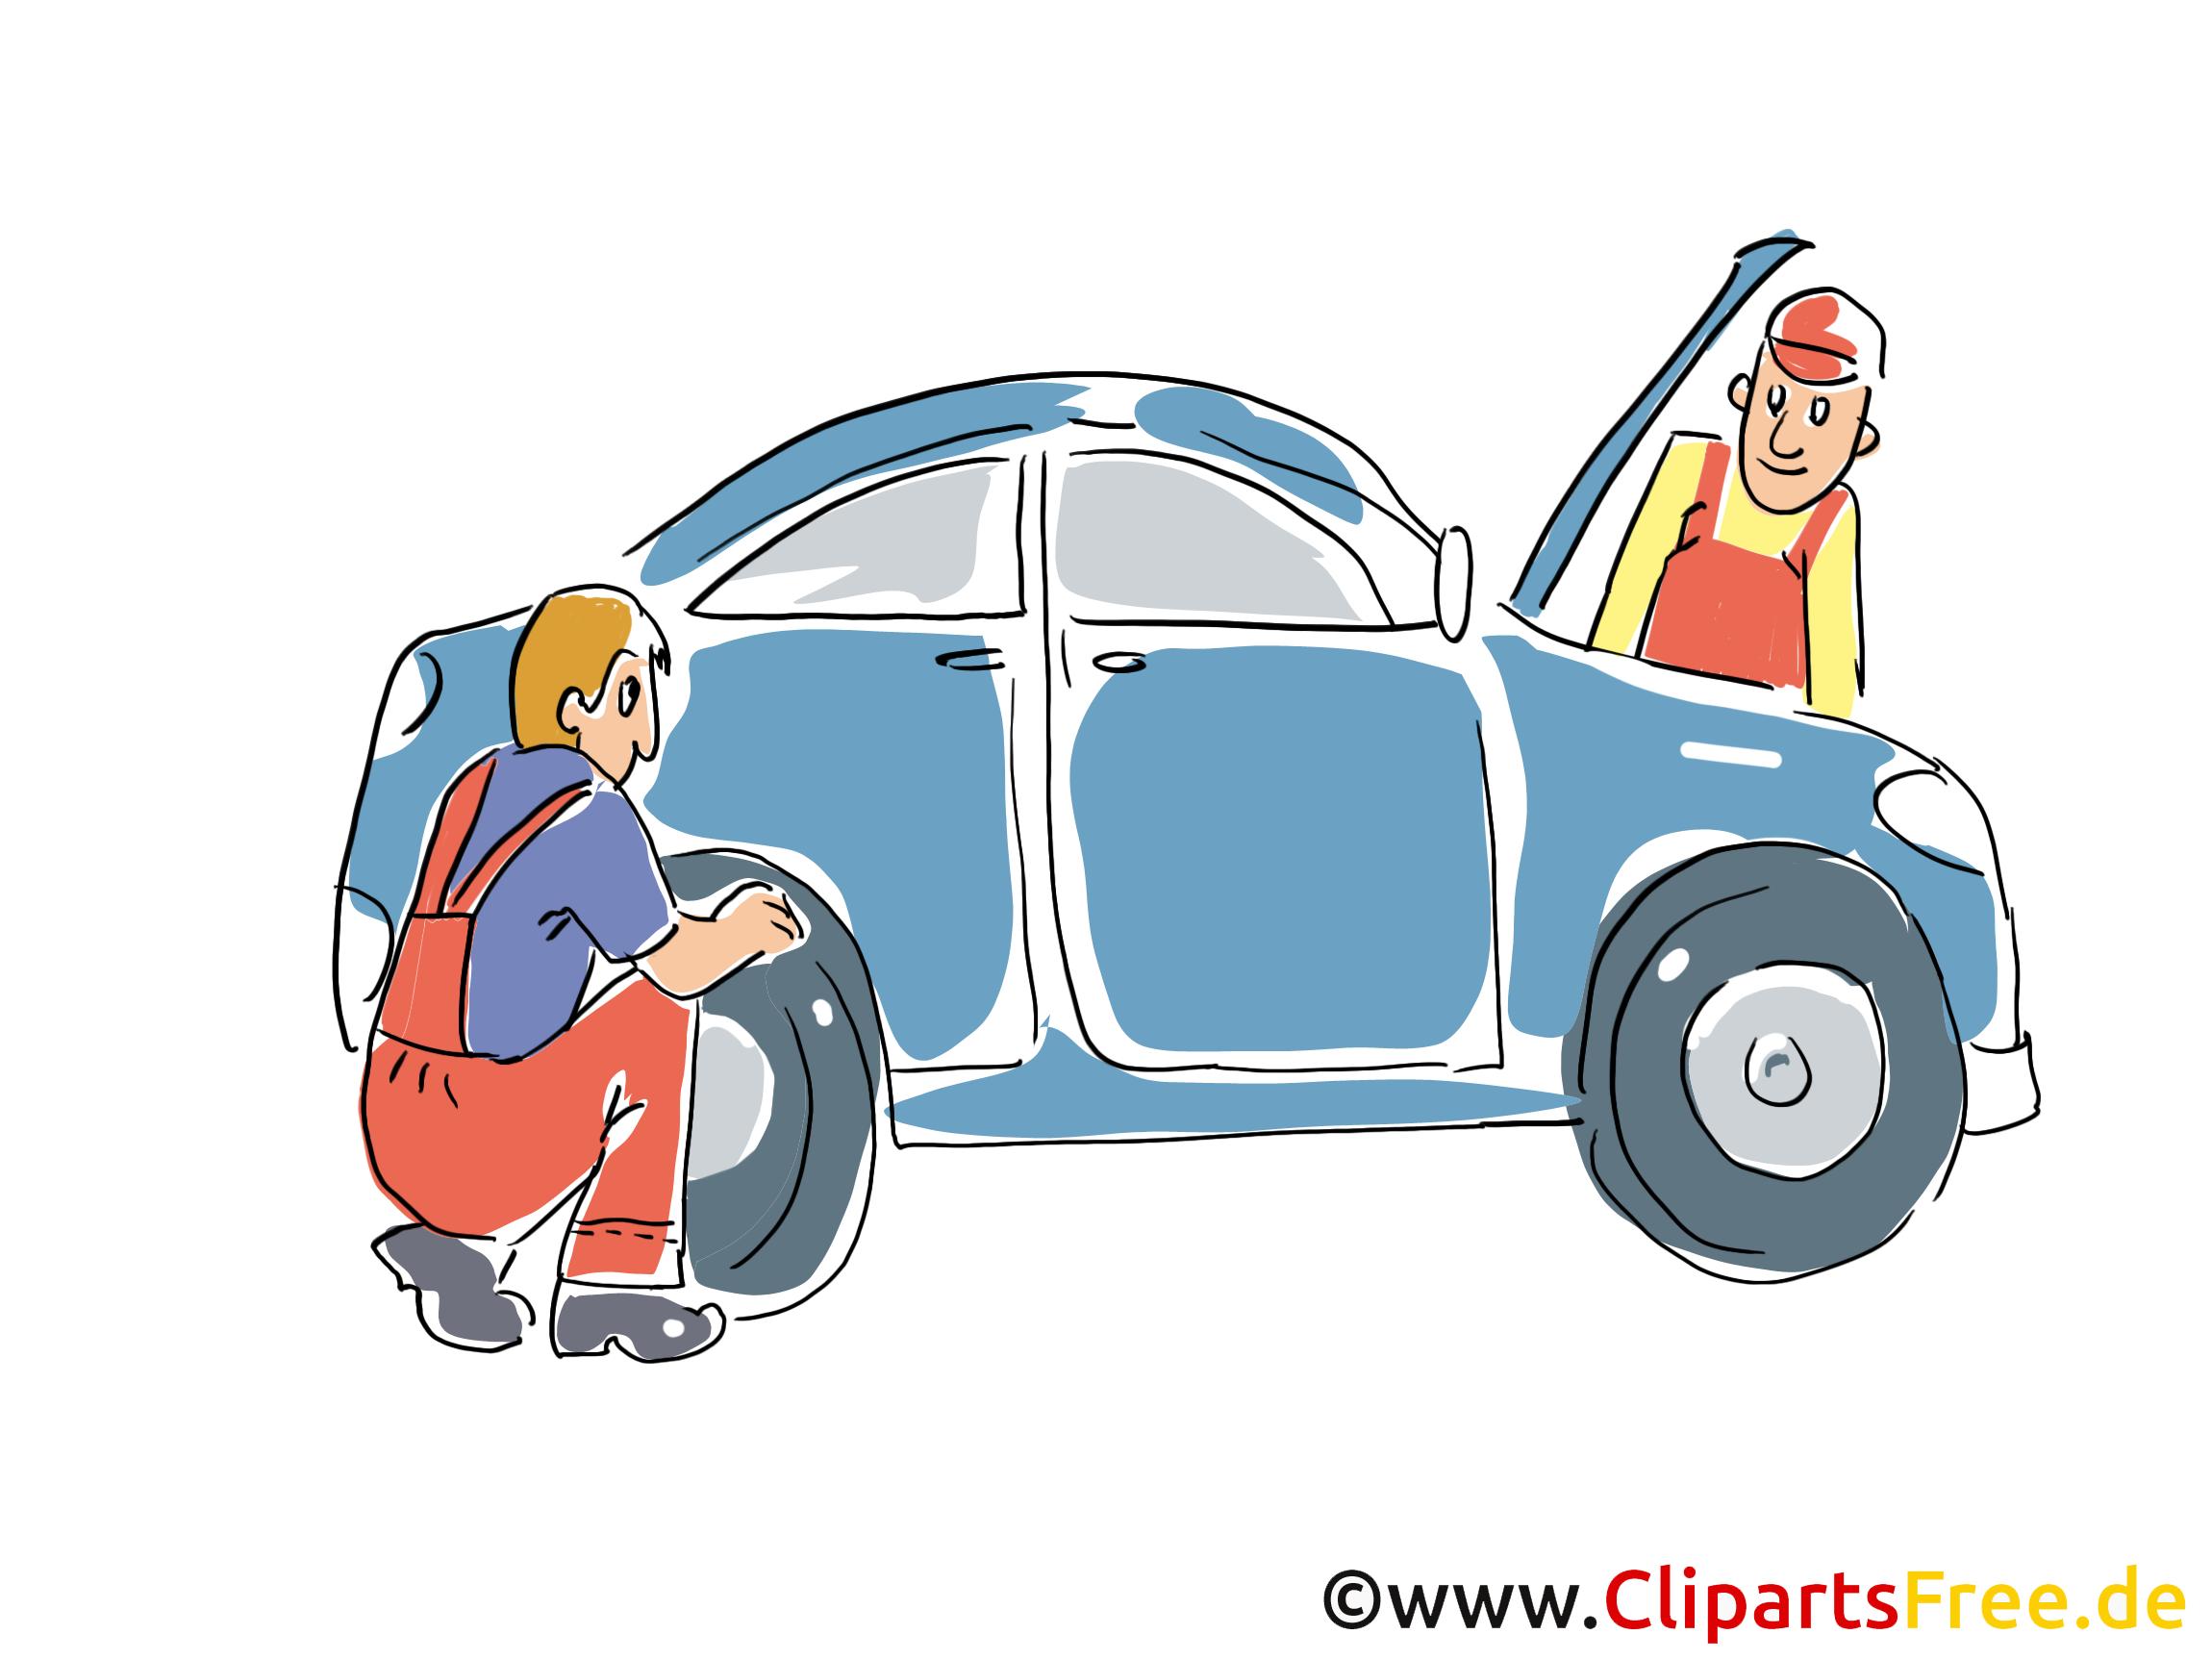 Reifeund Autoservice Clipart, Bild, Grafik, Cartoon, Illustration gratis